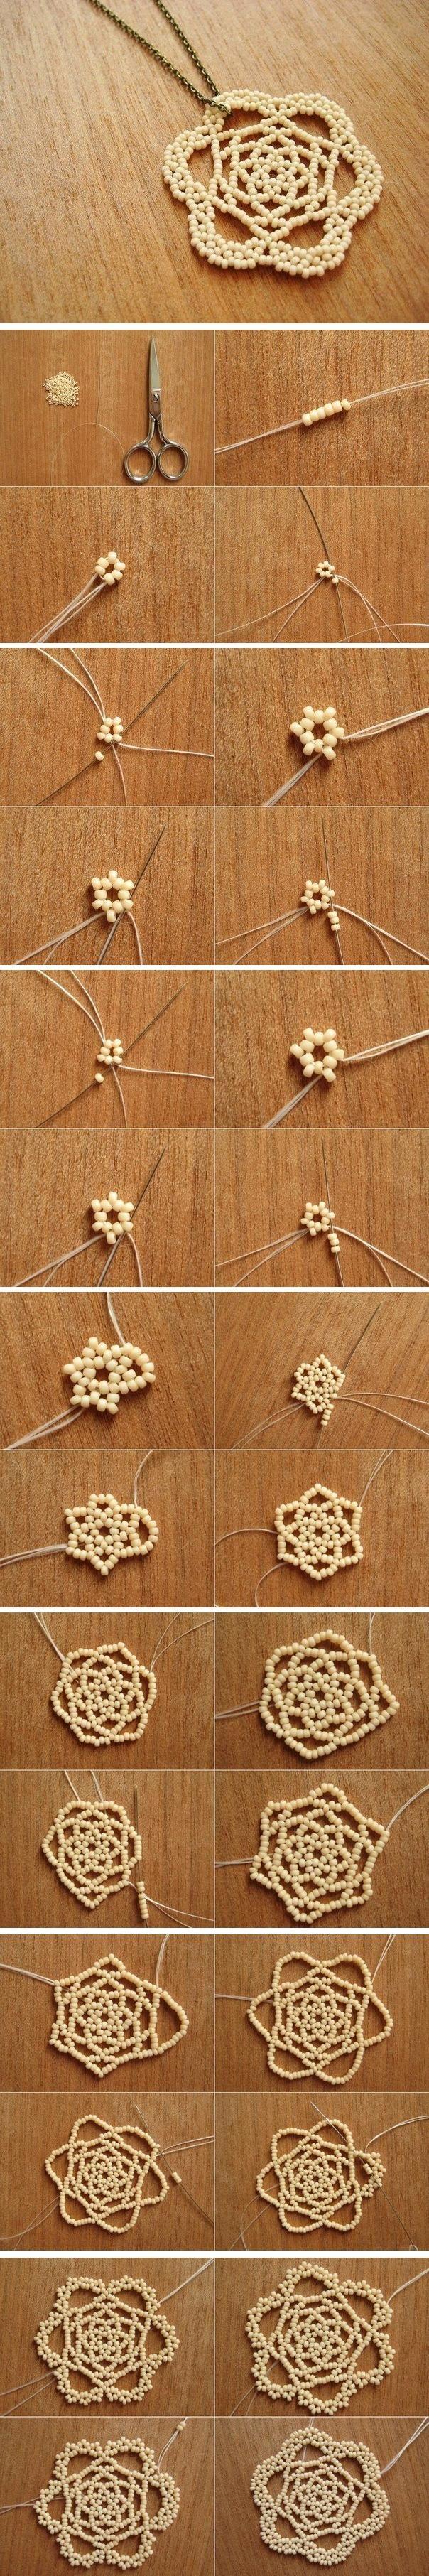 DIY Bead Flower Pendant